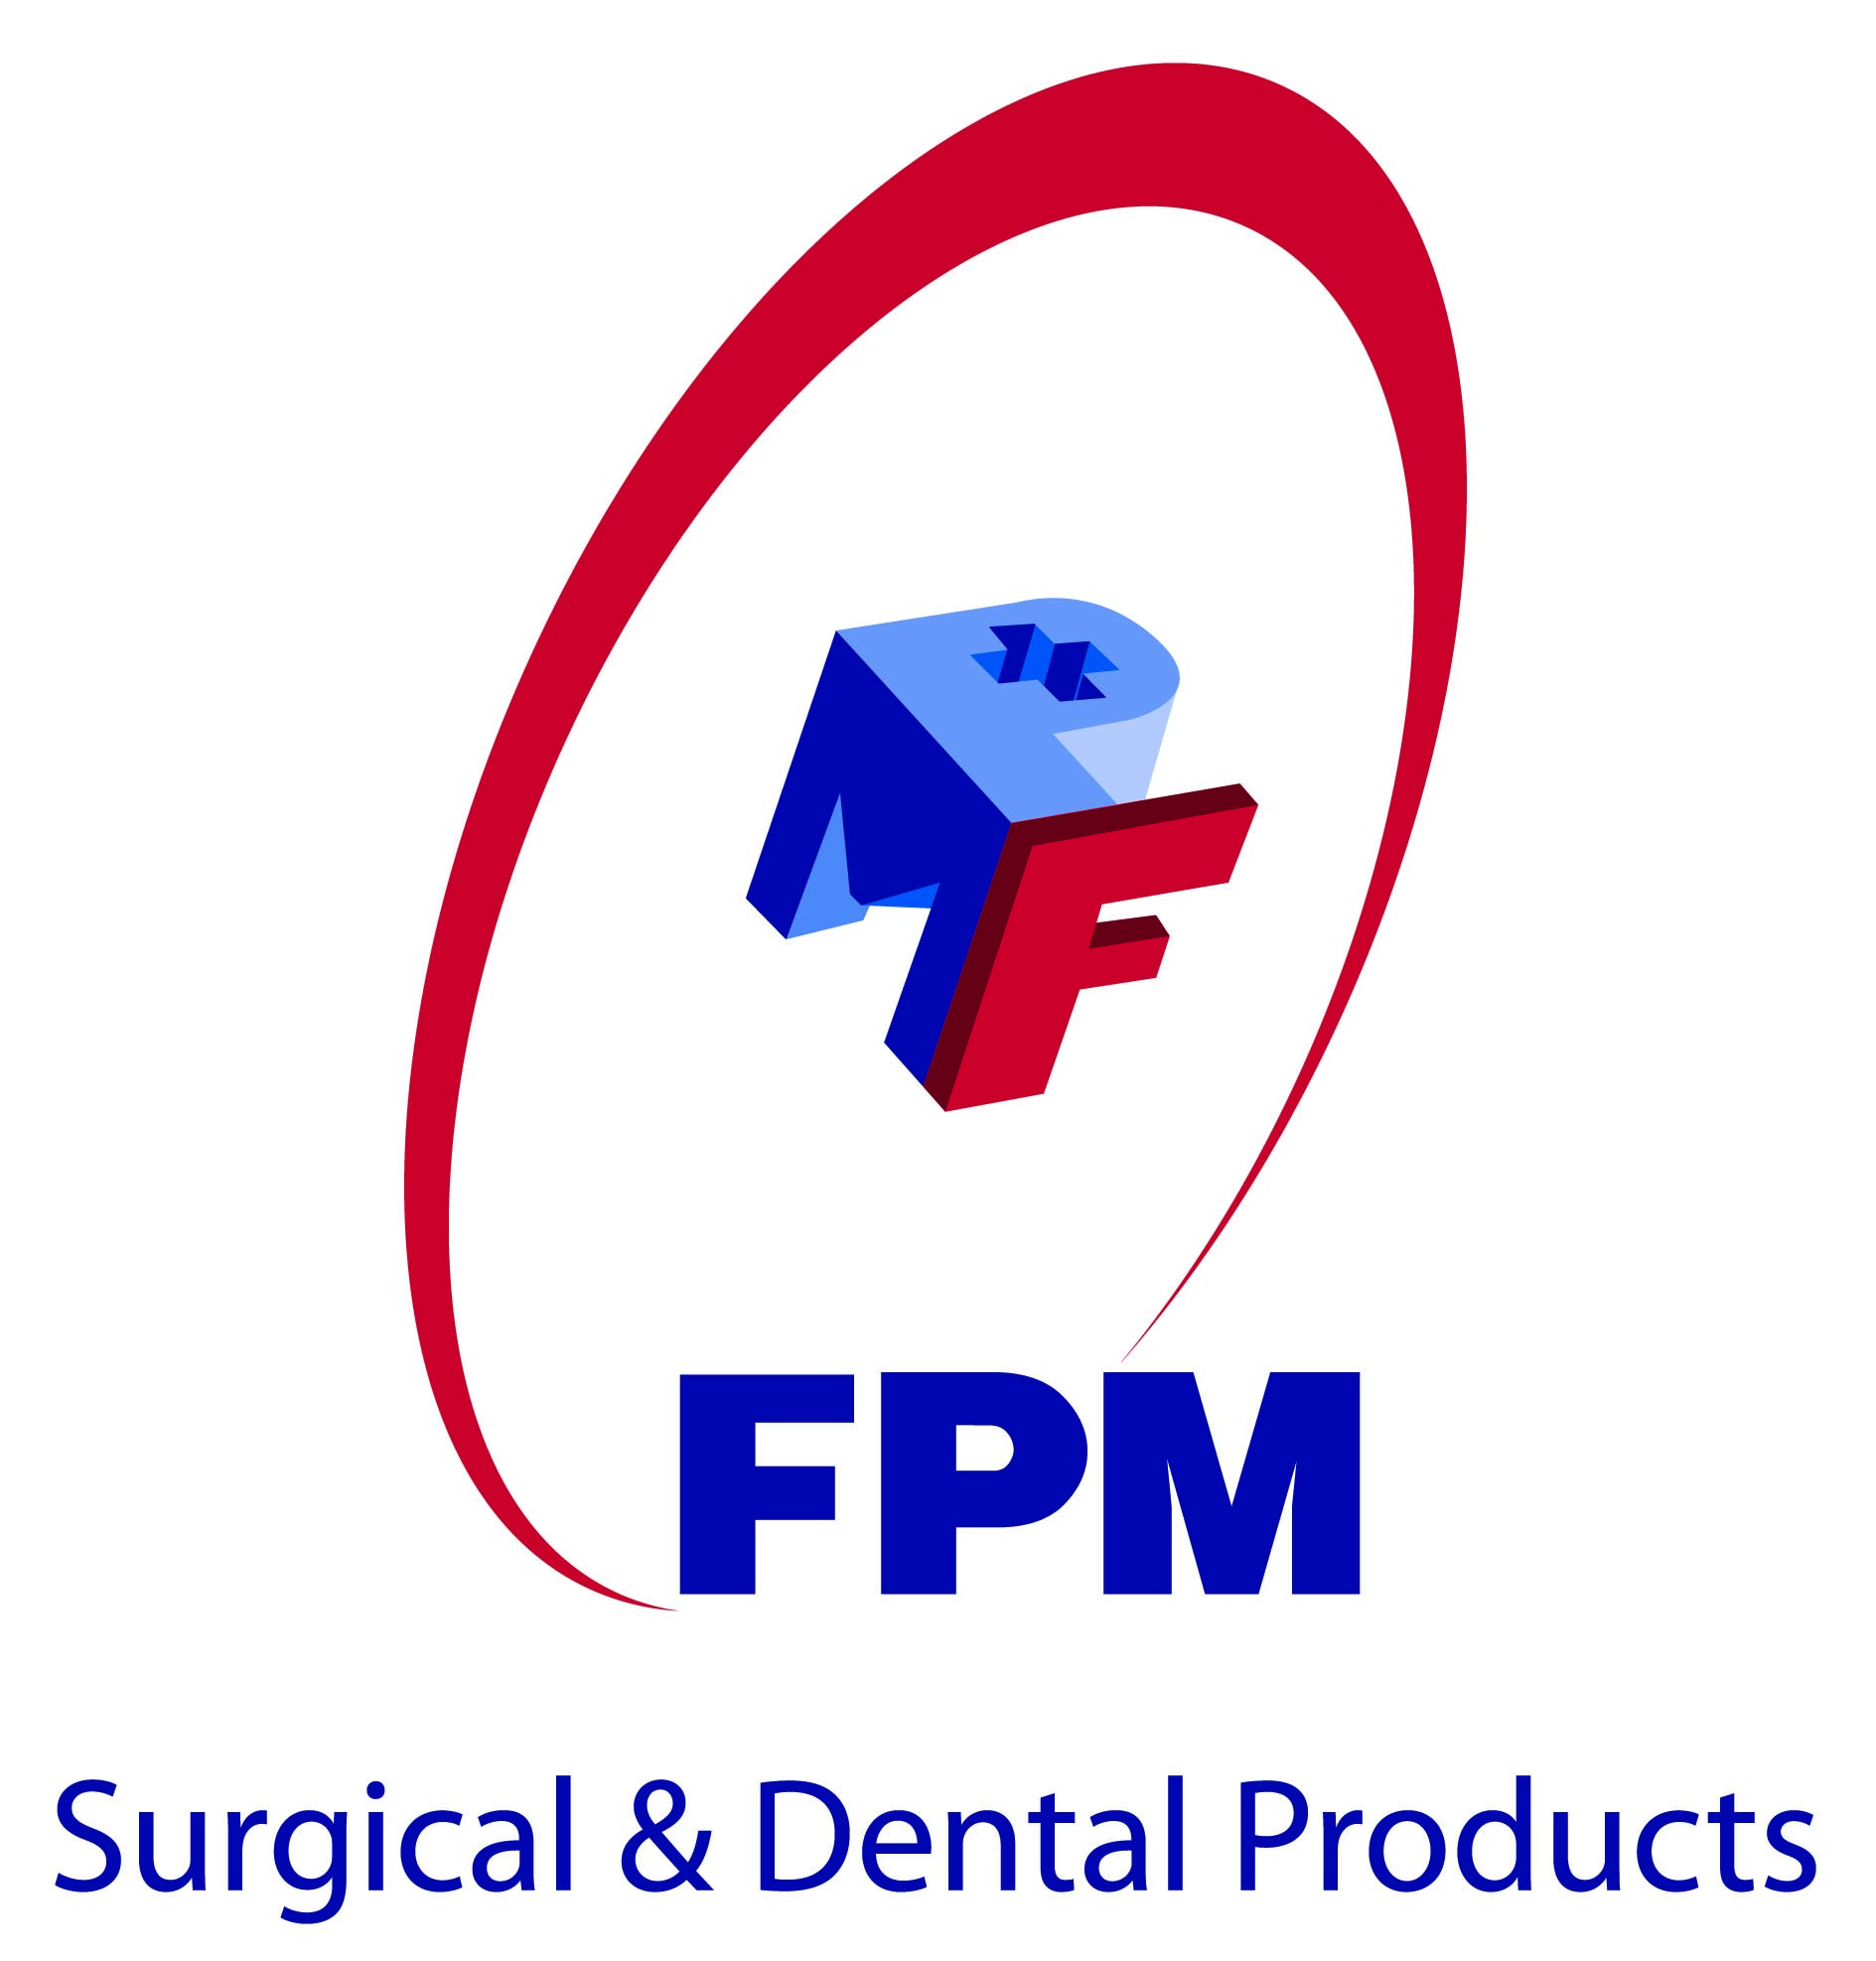 FPM S.a.r.l